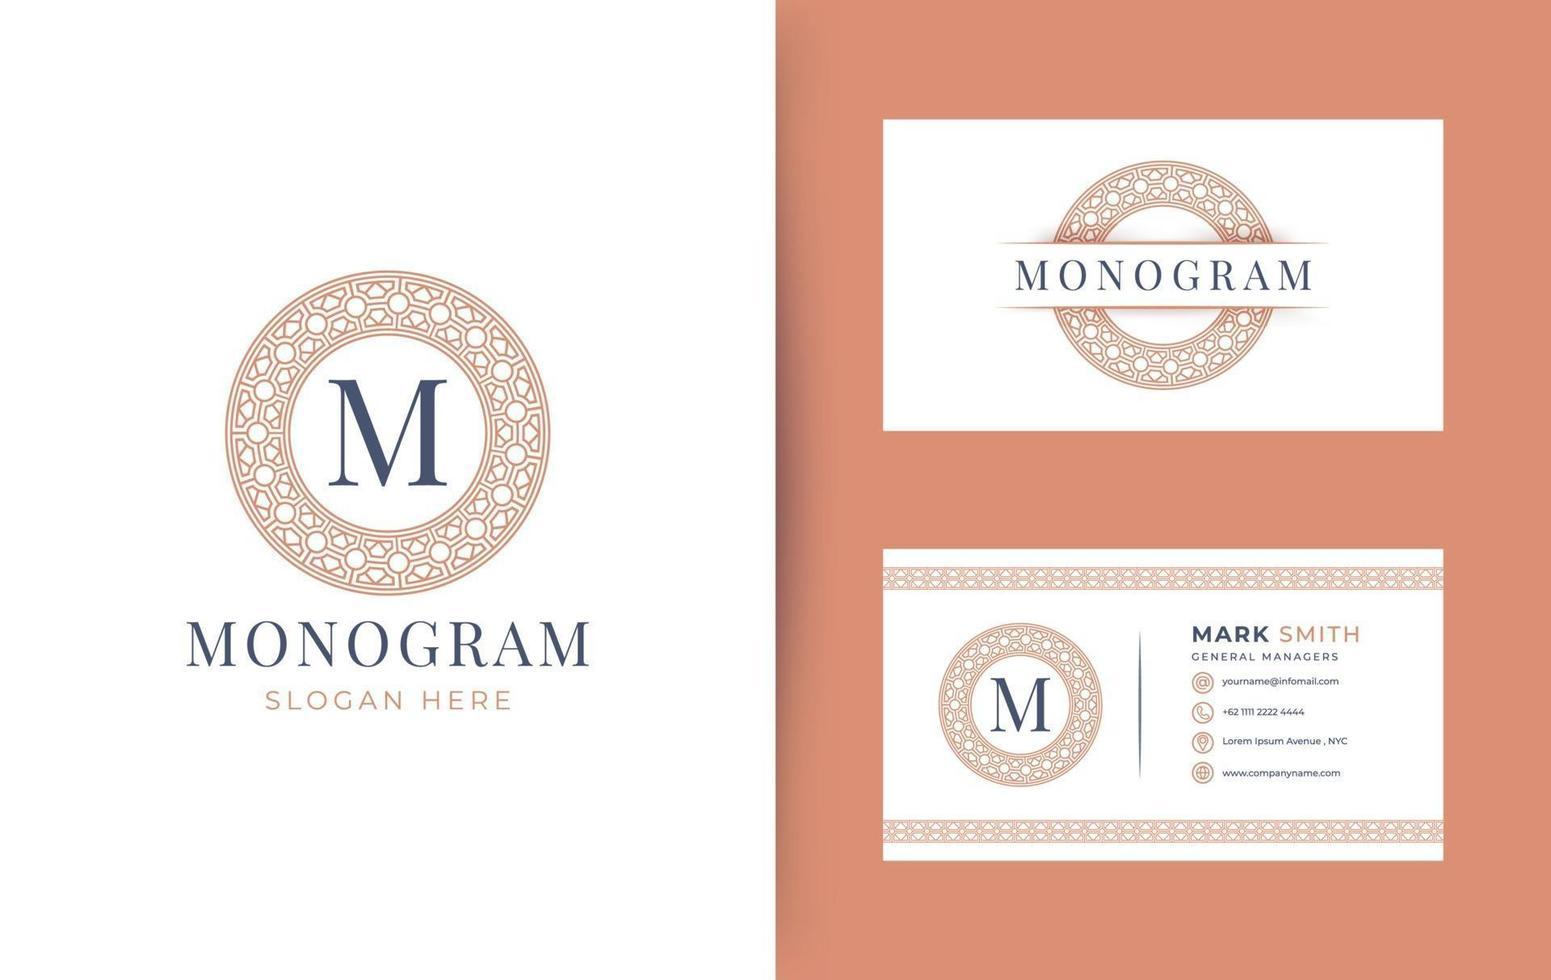 Logotipo da letra do monograma m com design de emblema de círculo geométrico, modelo de logotipo de monograma de cartão de visita mínimo vintage vetor